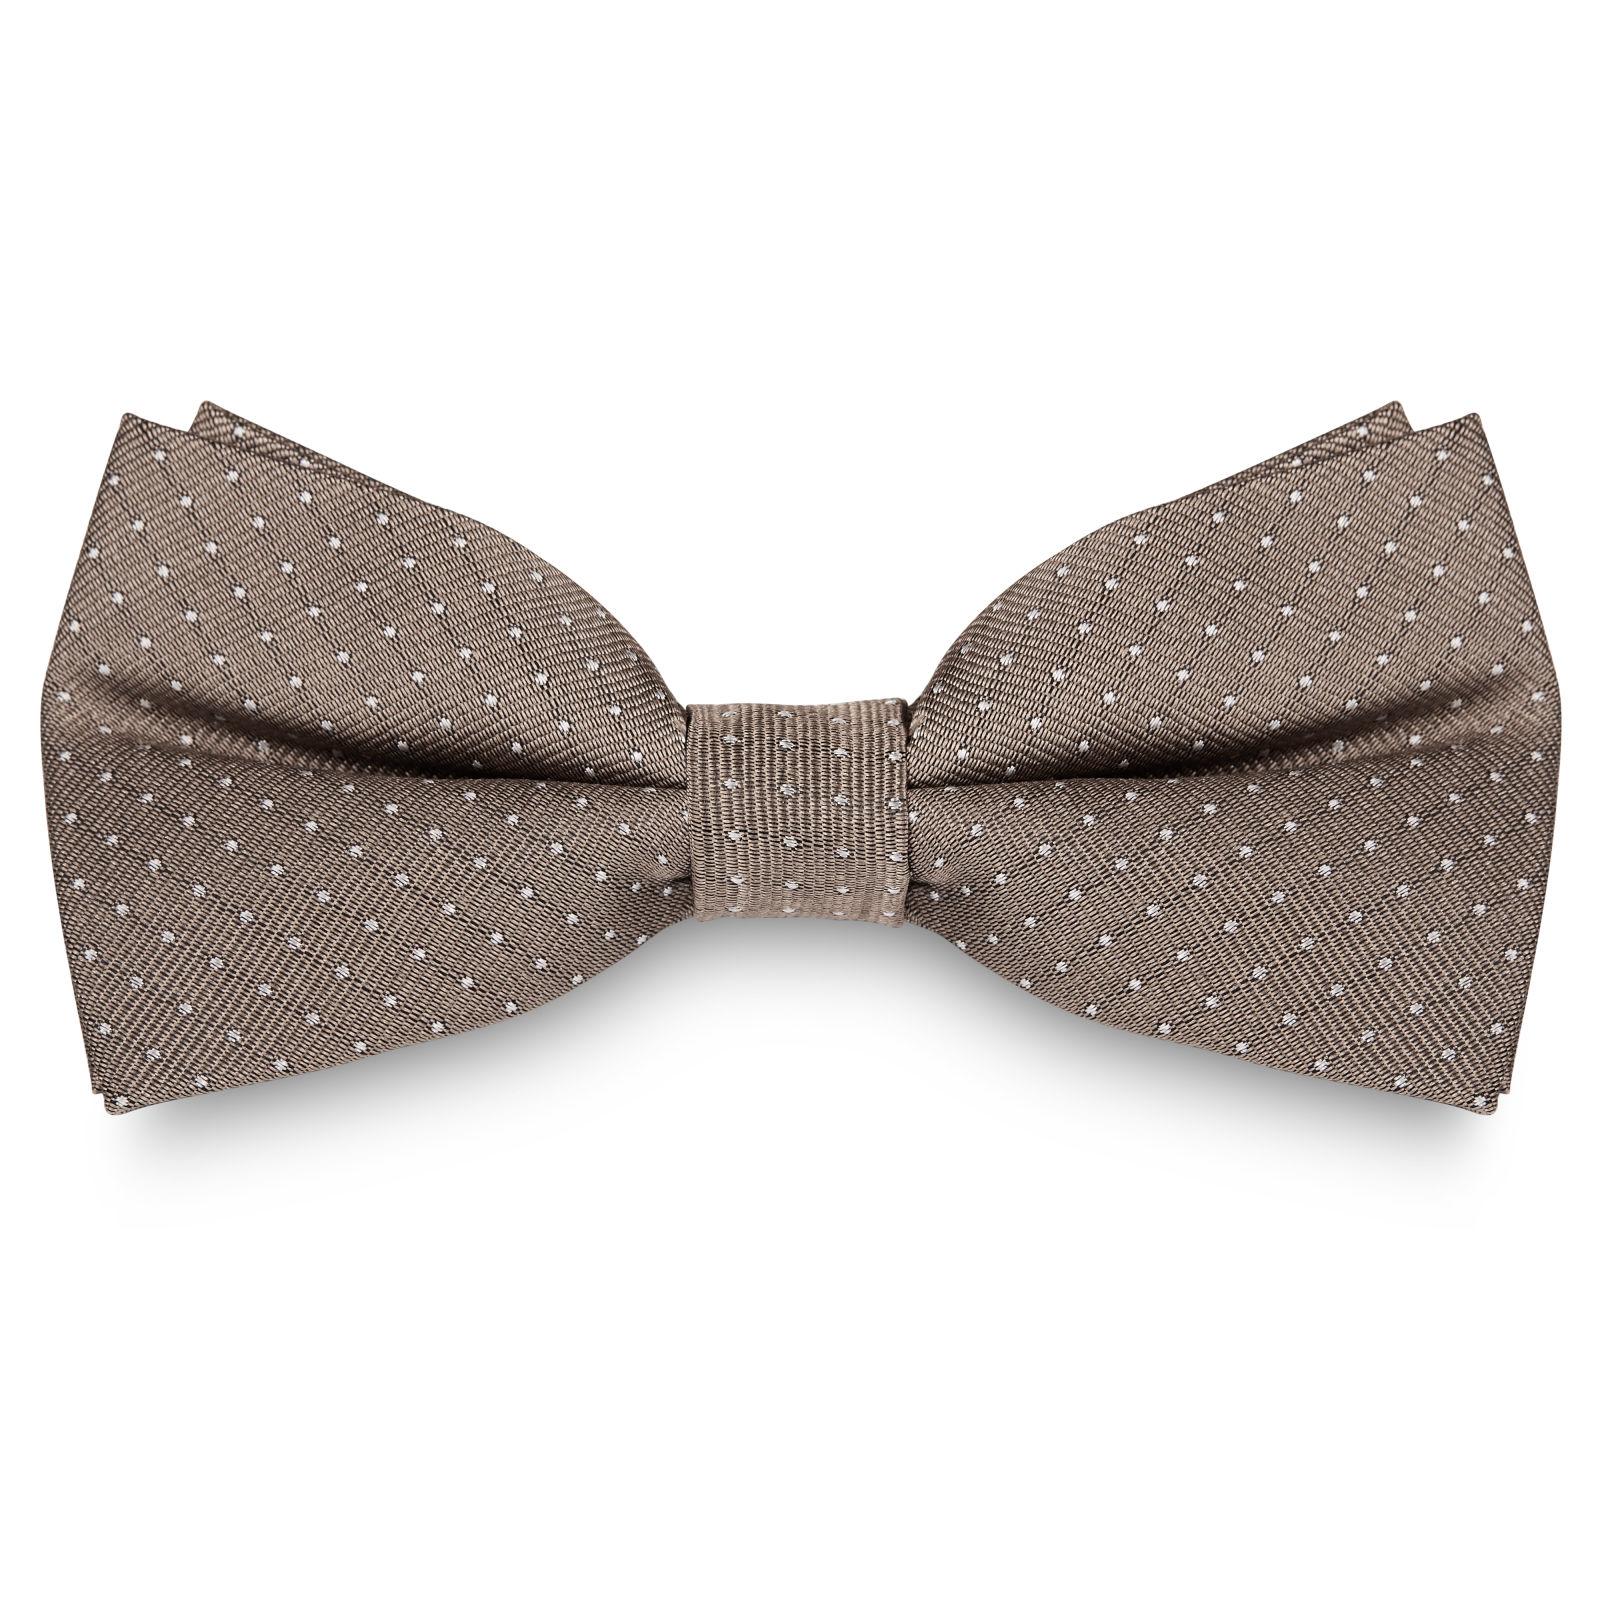 5c110470141 Beige Polka Dot Silk Bow Tie